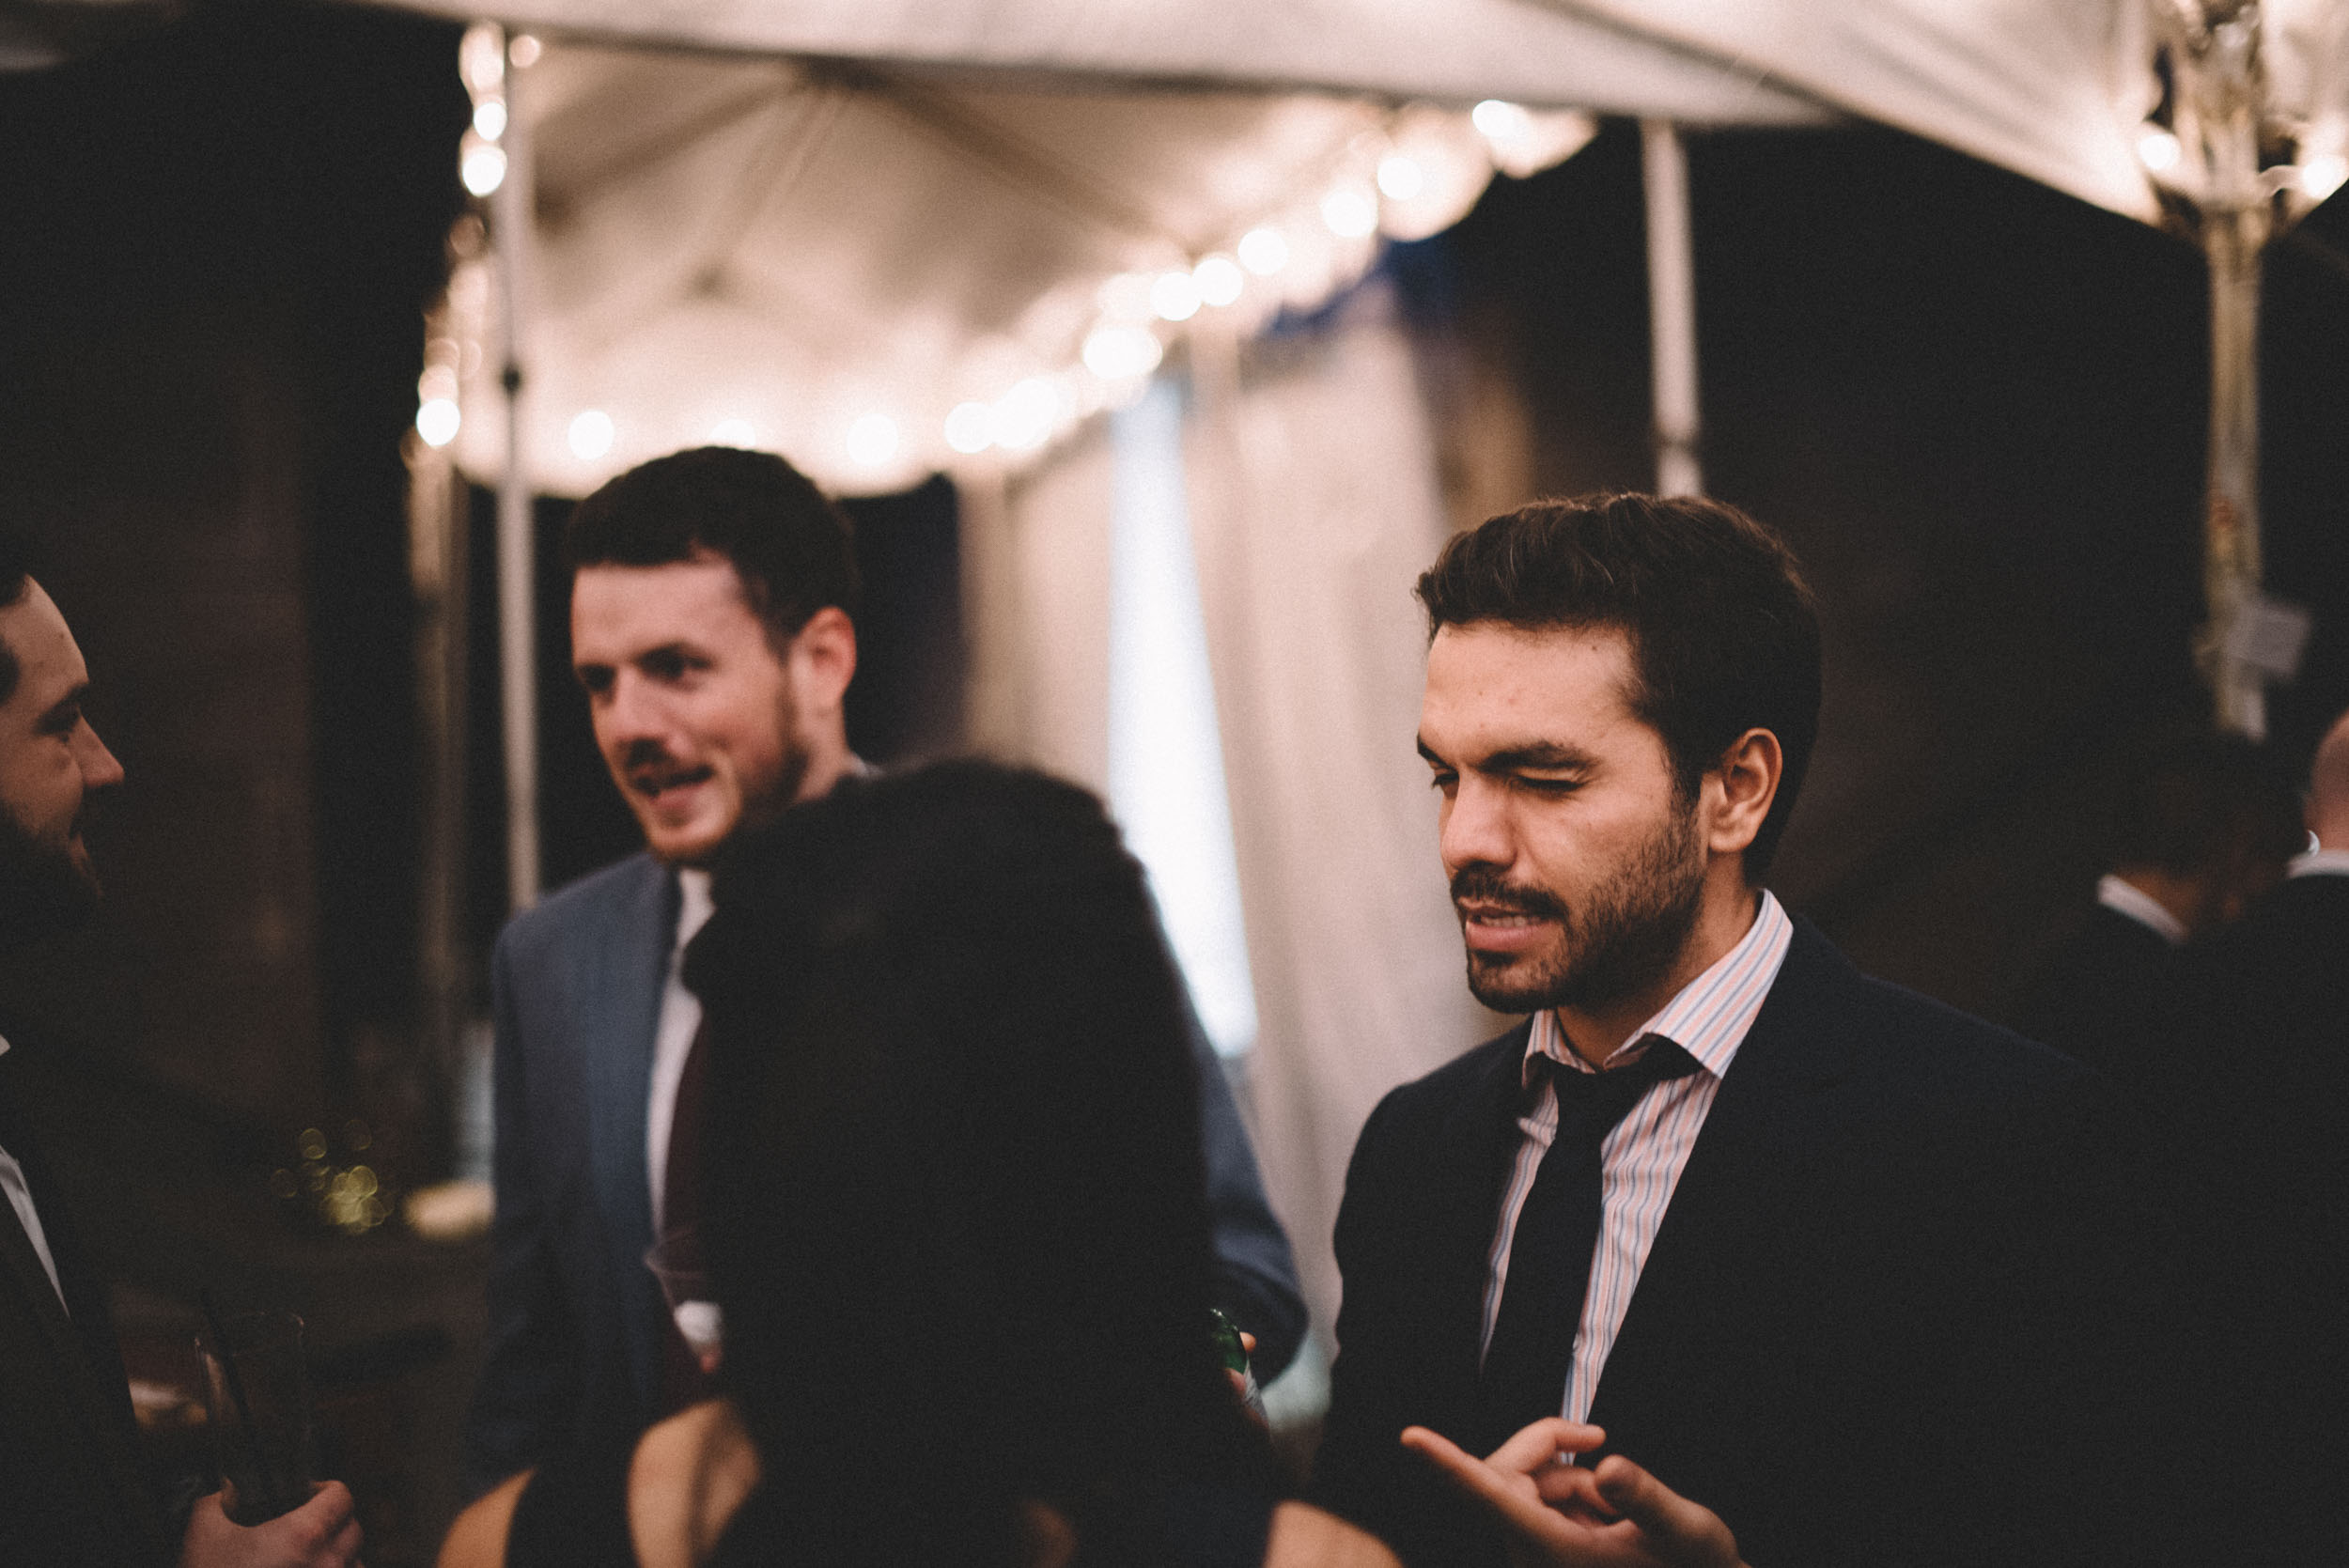 Dumbarton-House-wedding-64.jpg